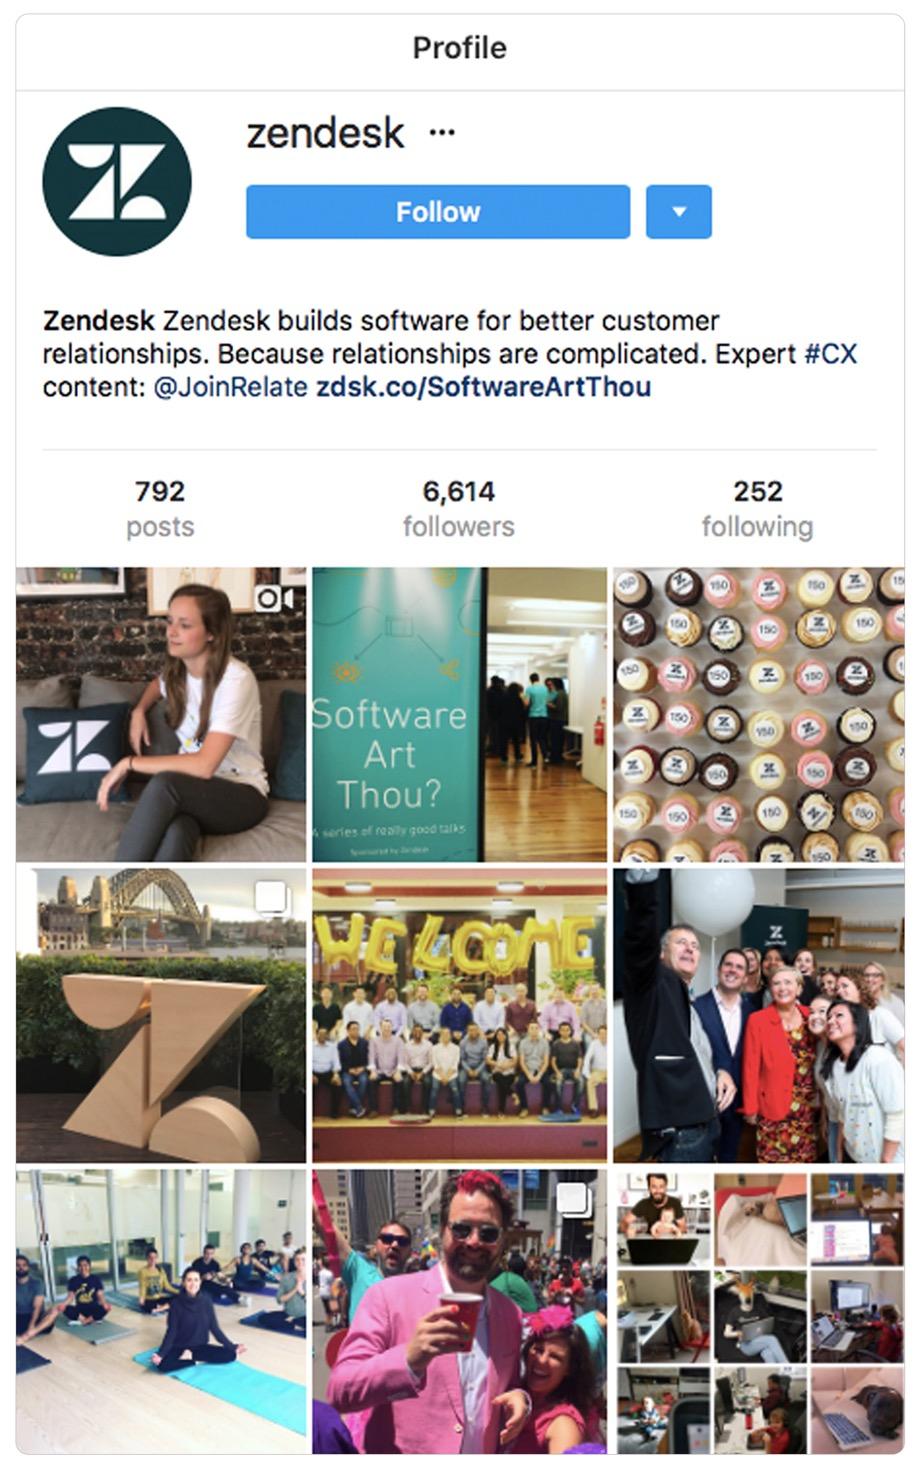 Zendesk_Customer_Images_Instagram